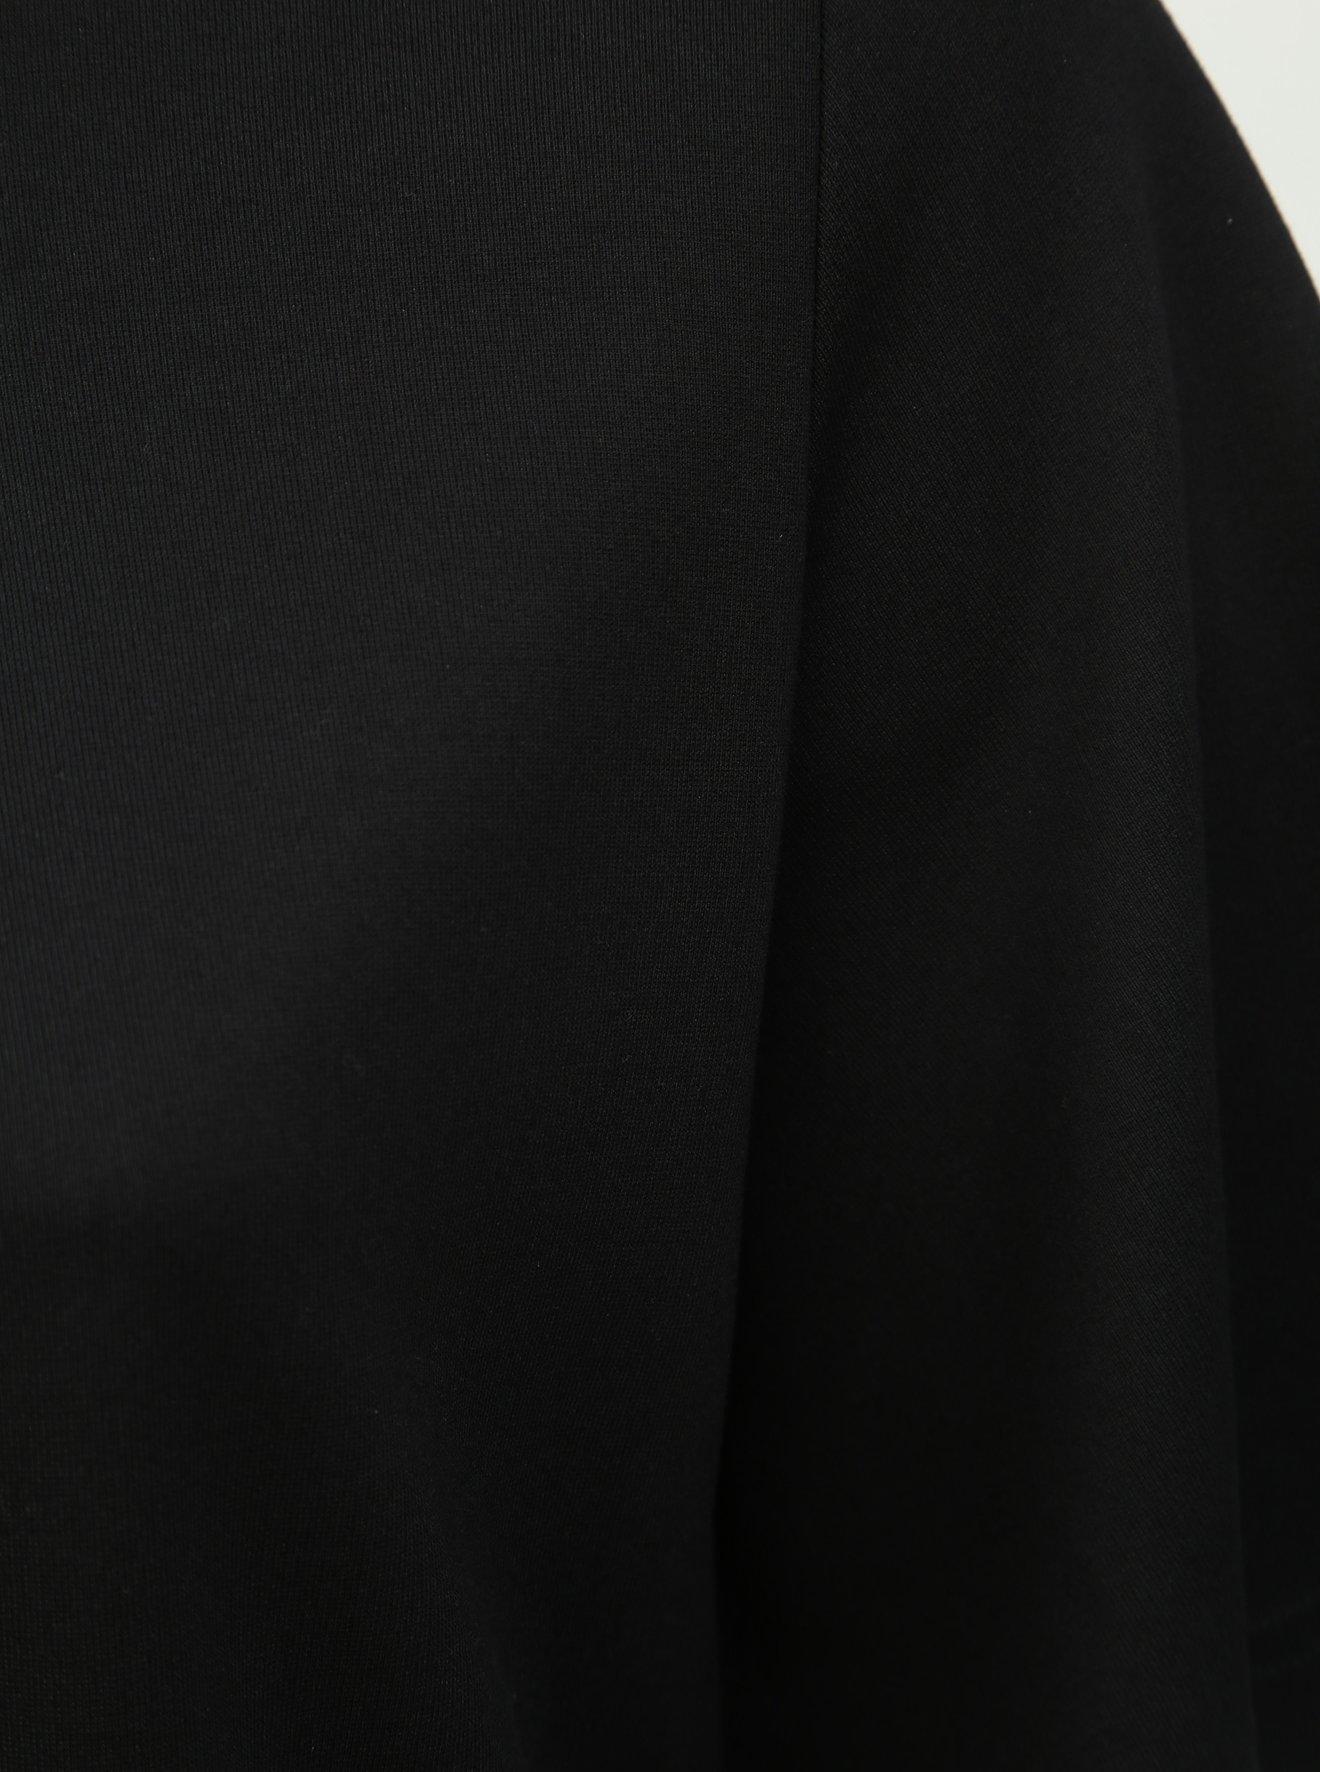 Černá halenka s korálky Ulla Popken